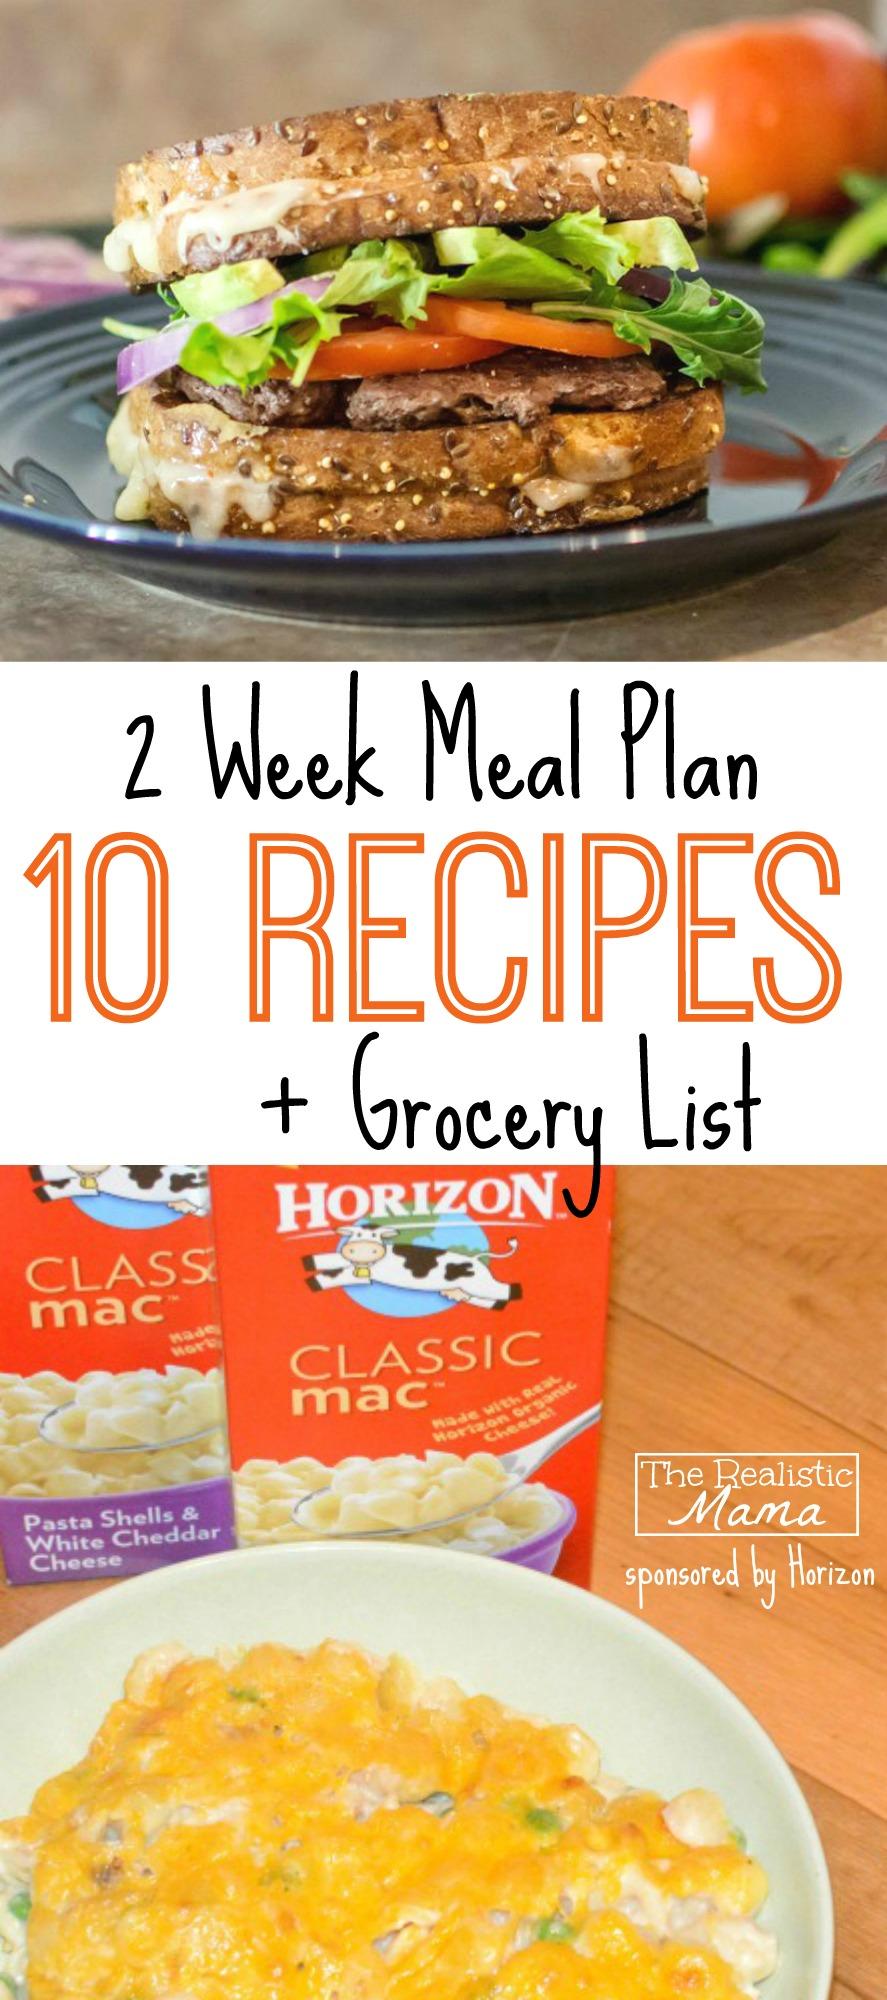 2 Week Meal Plan FREE -- 10 Recipes + Grocery List!